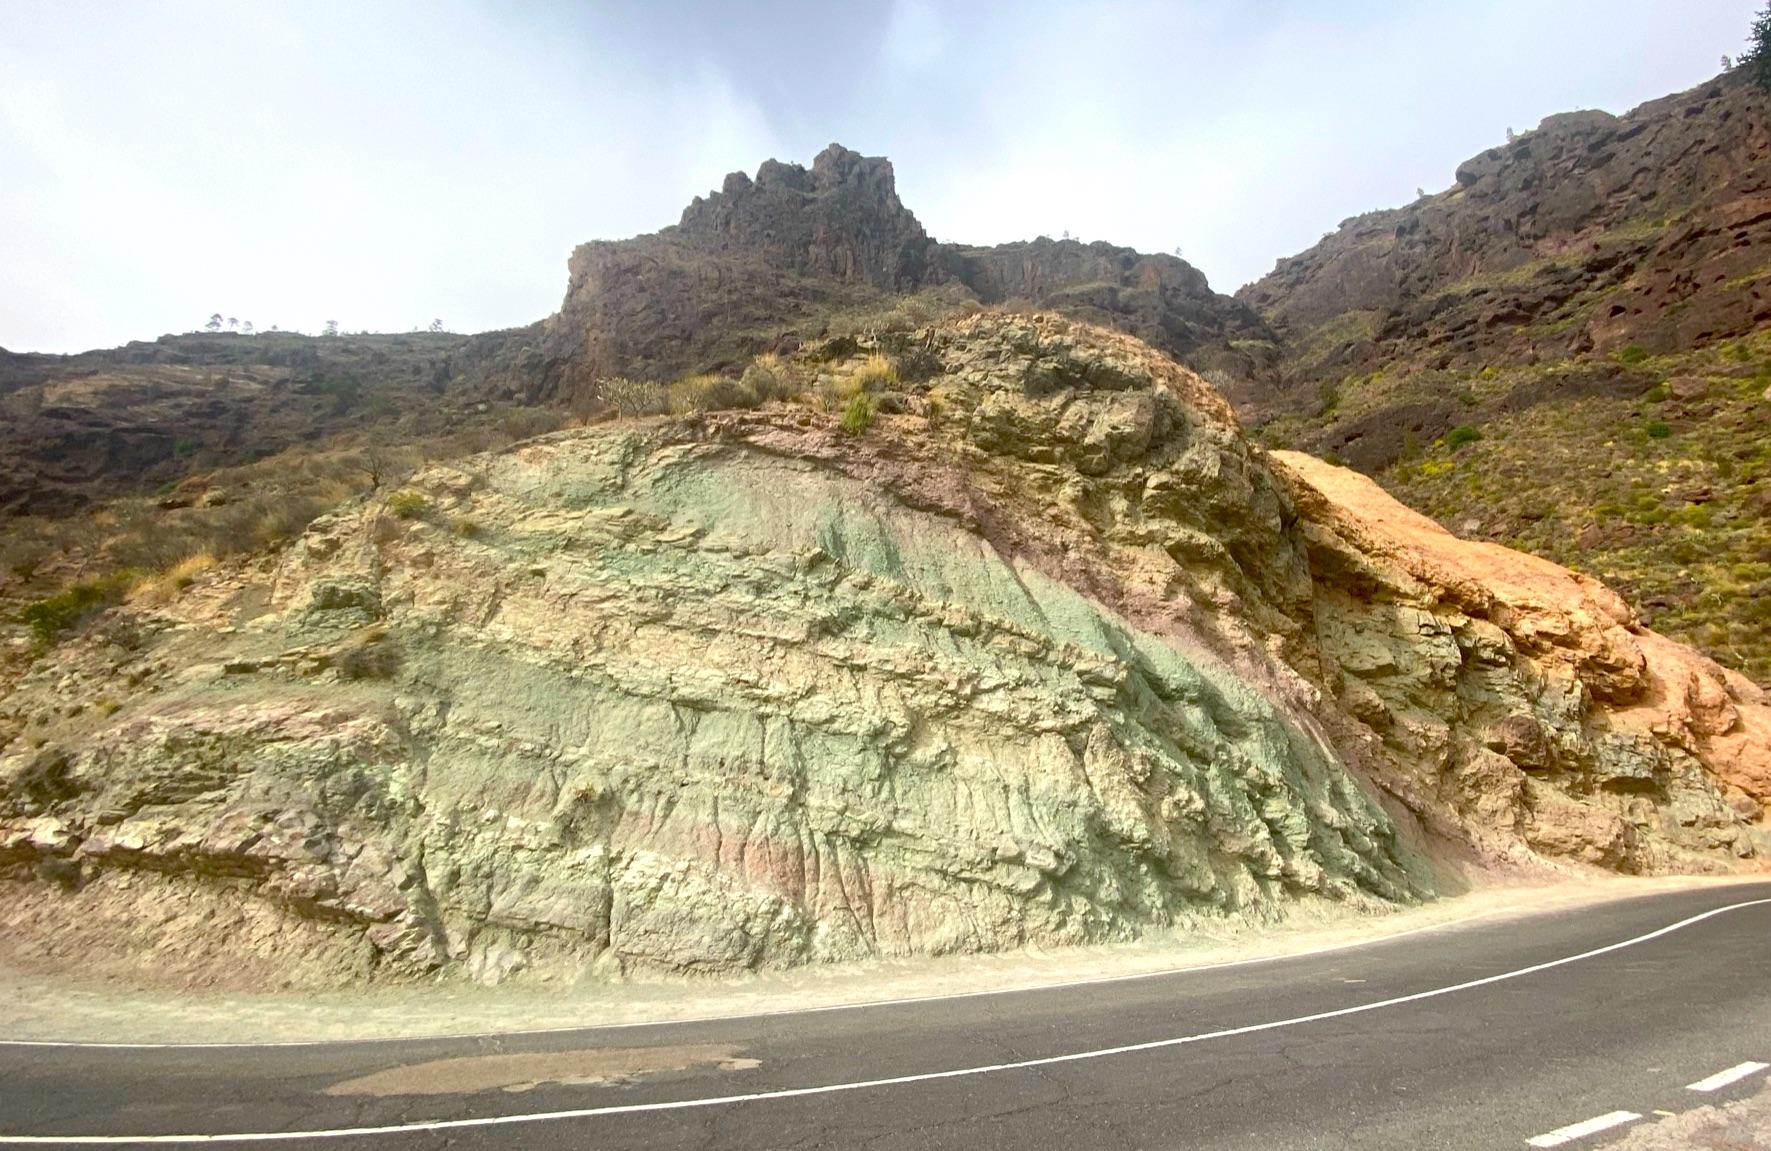 Tolles Farbenspiel auf Gran Canaria